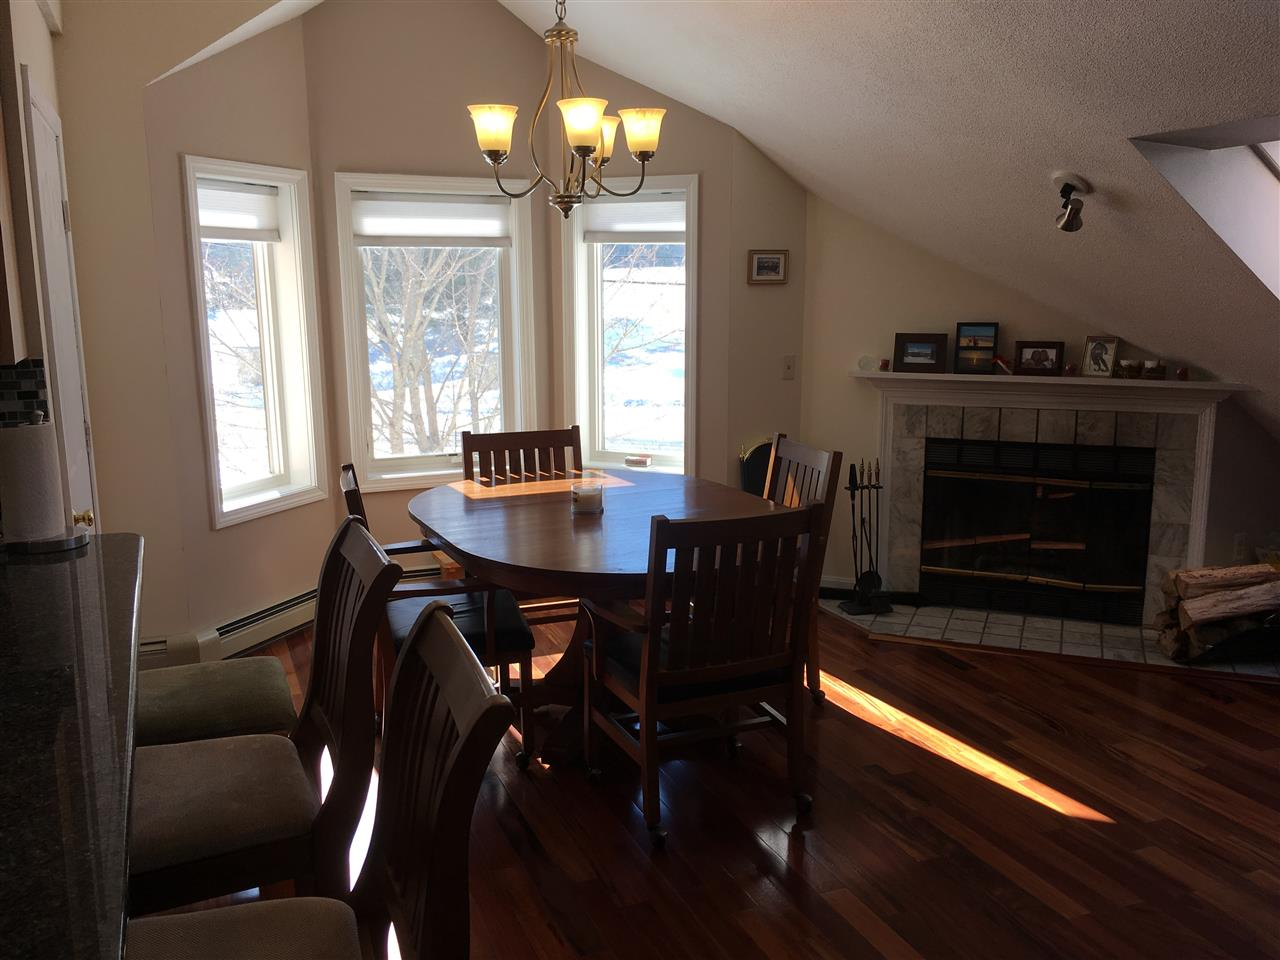 Mount-Snow-Real-Estate-4617963-6